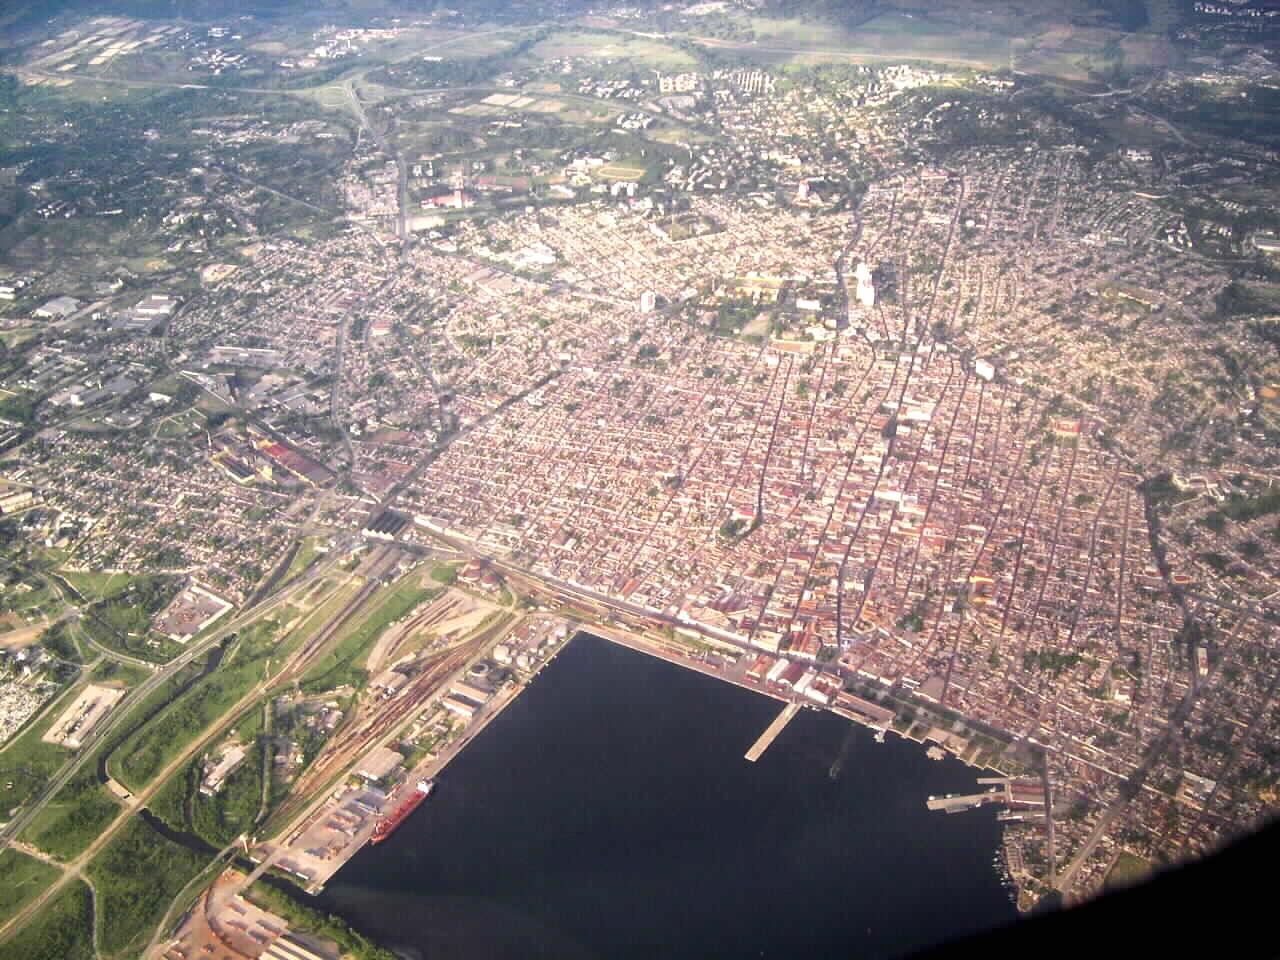 Vista aerea Stgo